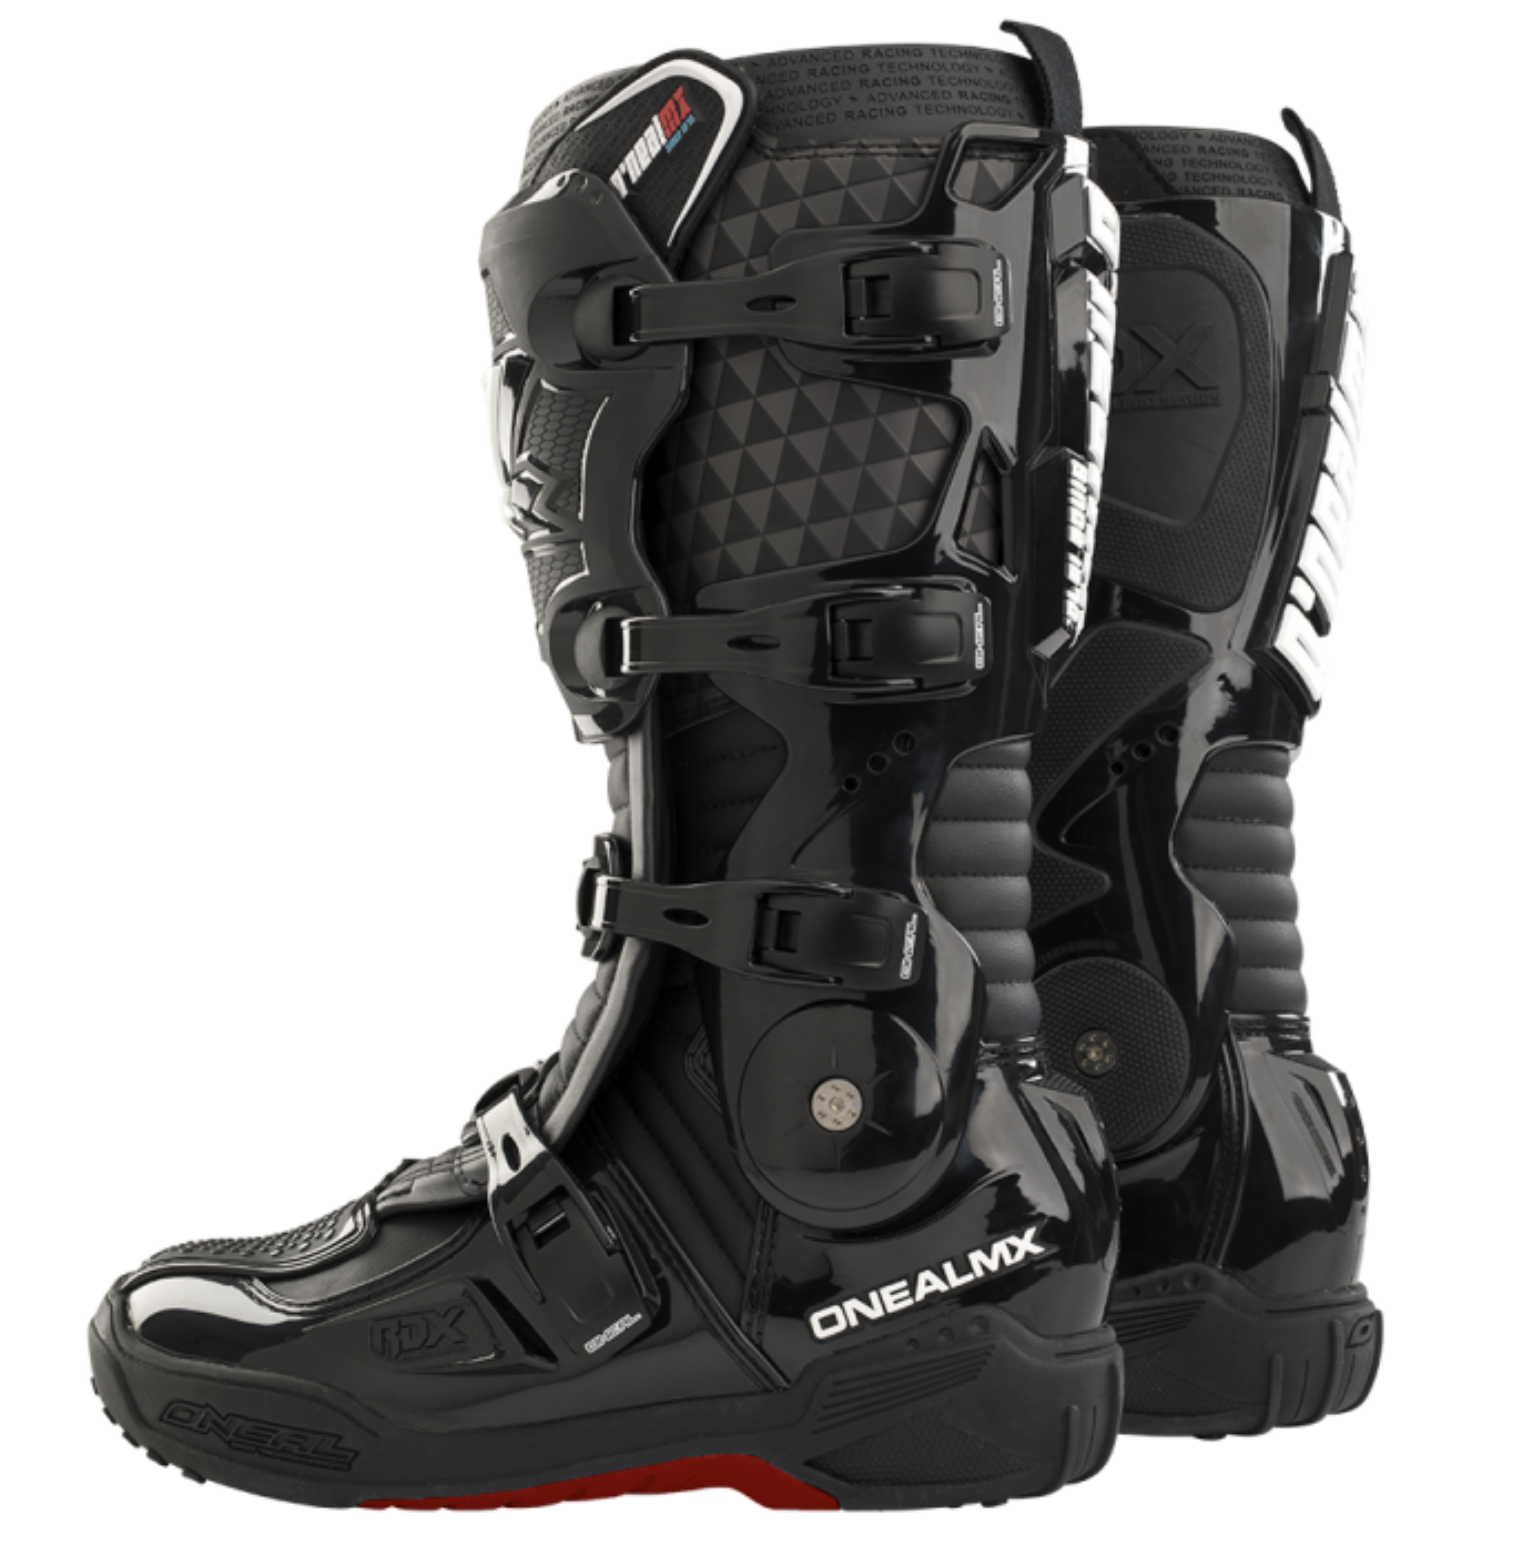 O'Neal motocross boots